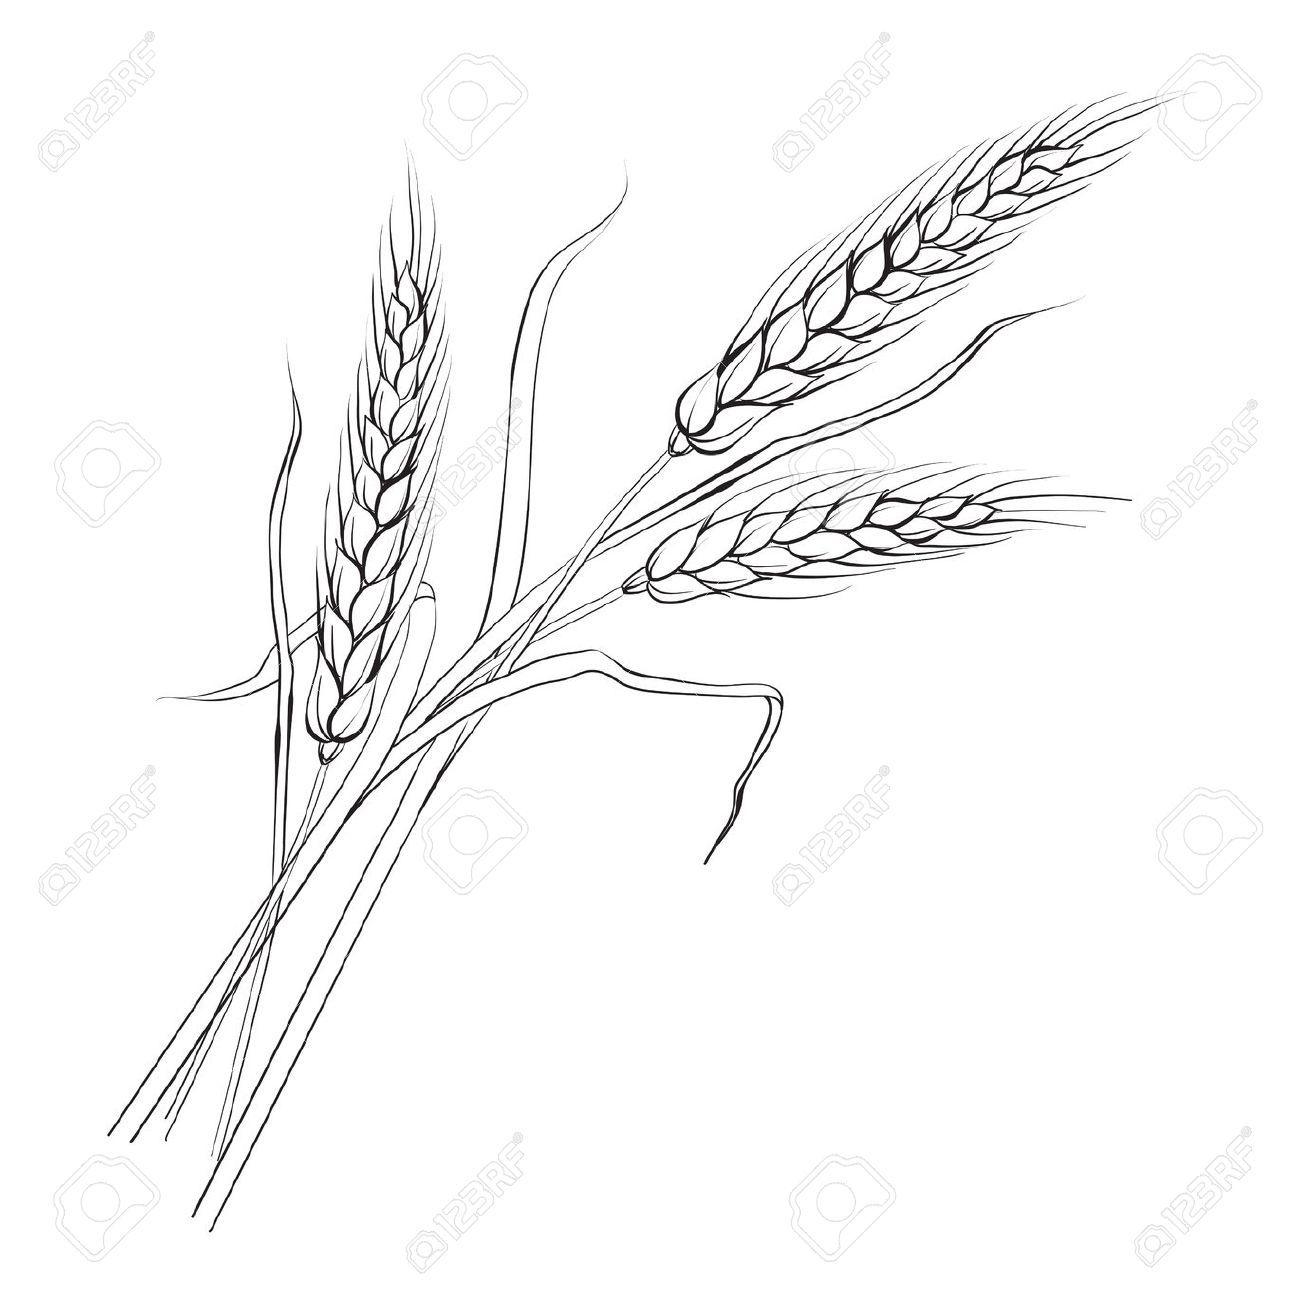 Wheat Line Drawings Google Search Art Projects Pinterest